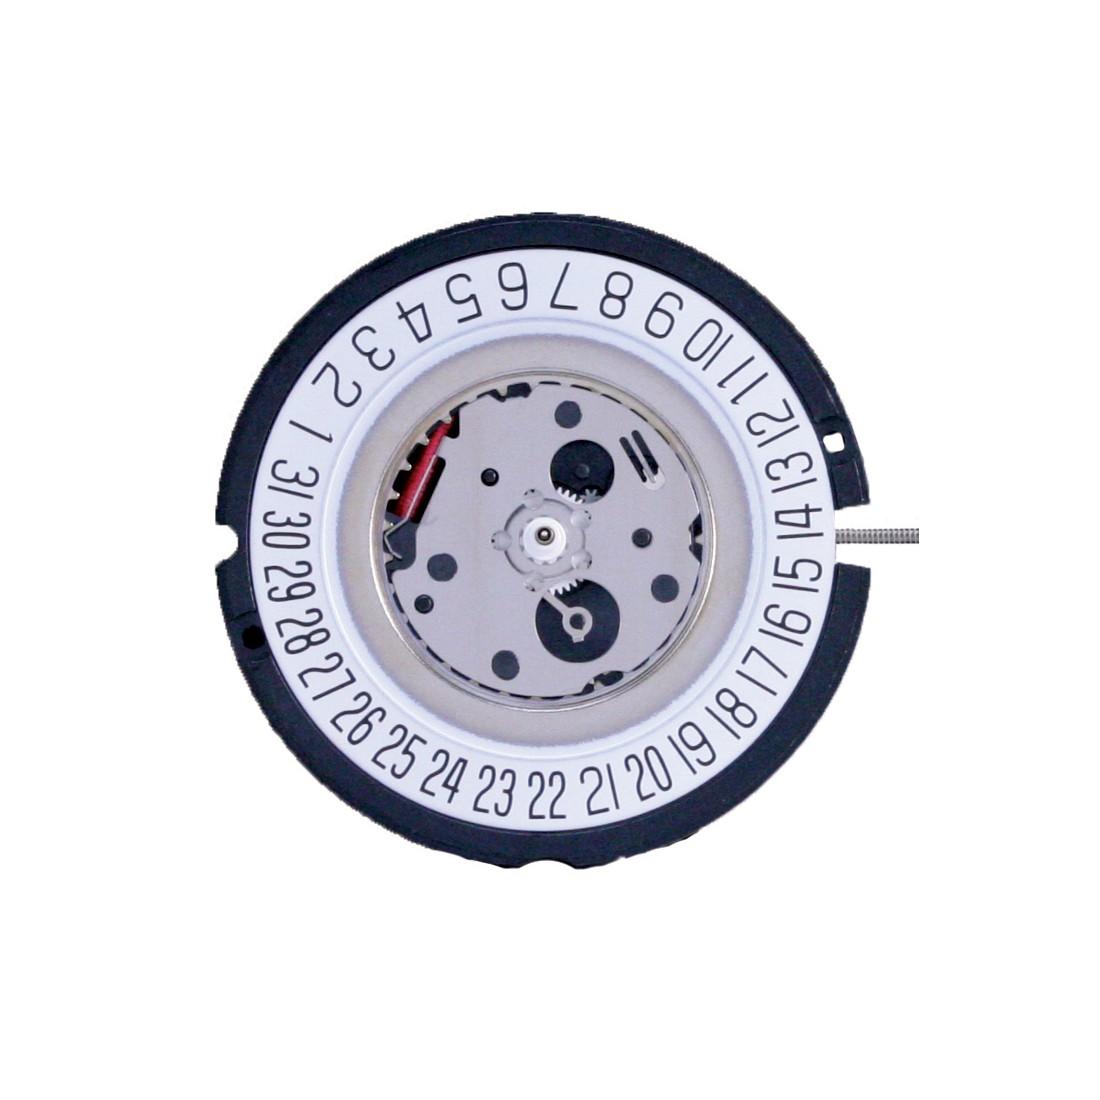 ETA 805.112-D6 Quartz Watch Movement